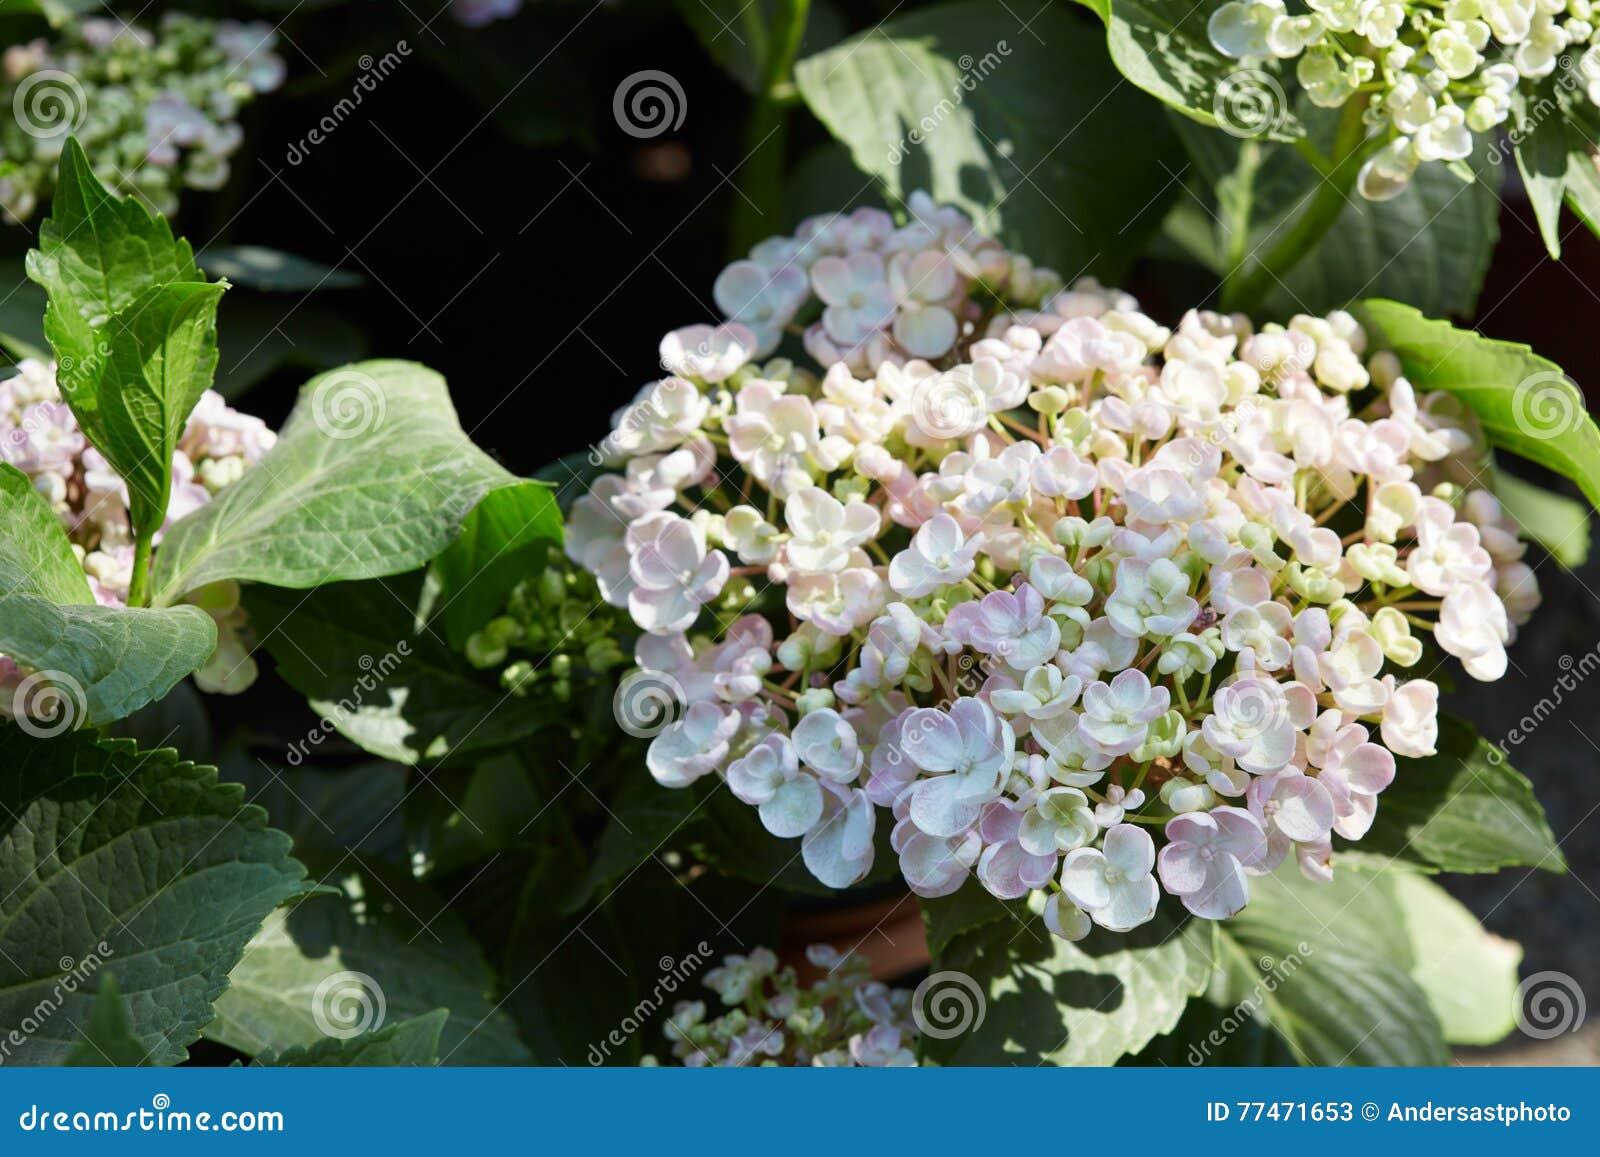 Hydrangea Serrata Pale Pink Flowers Stock Image Image Of Pale